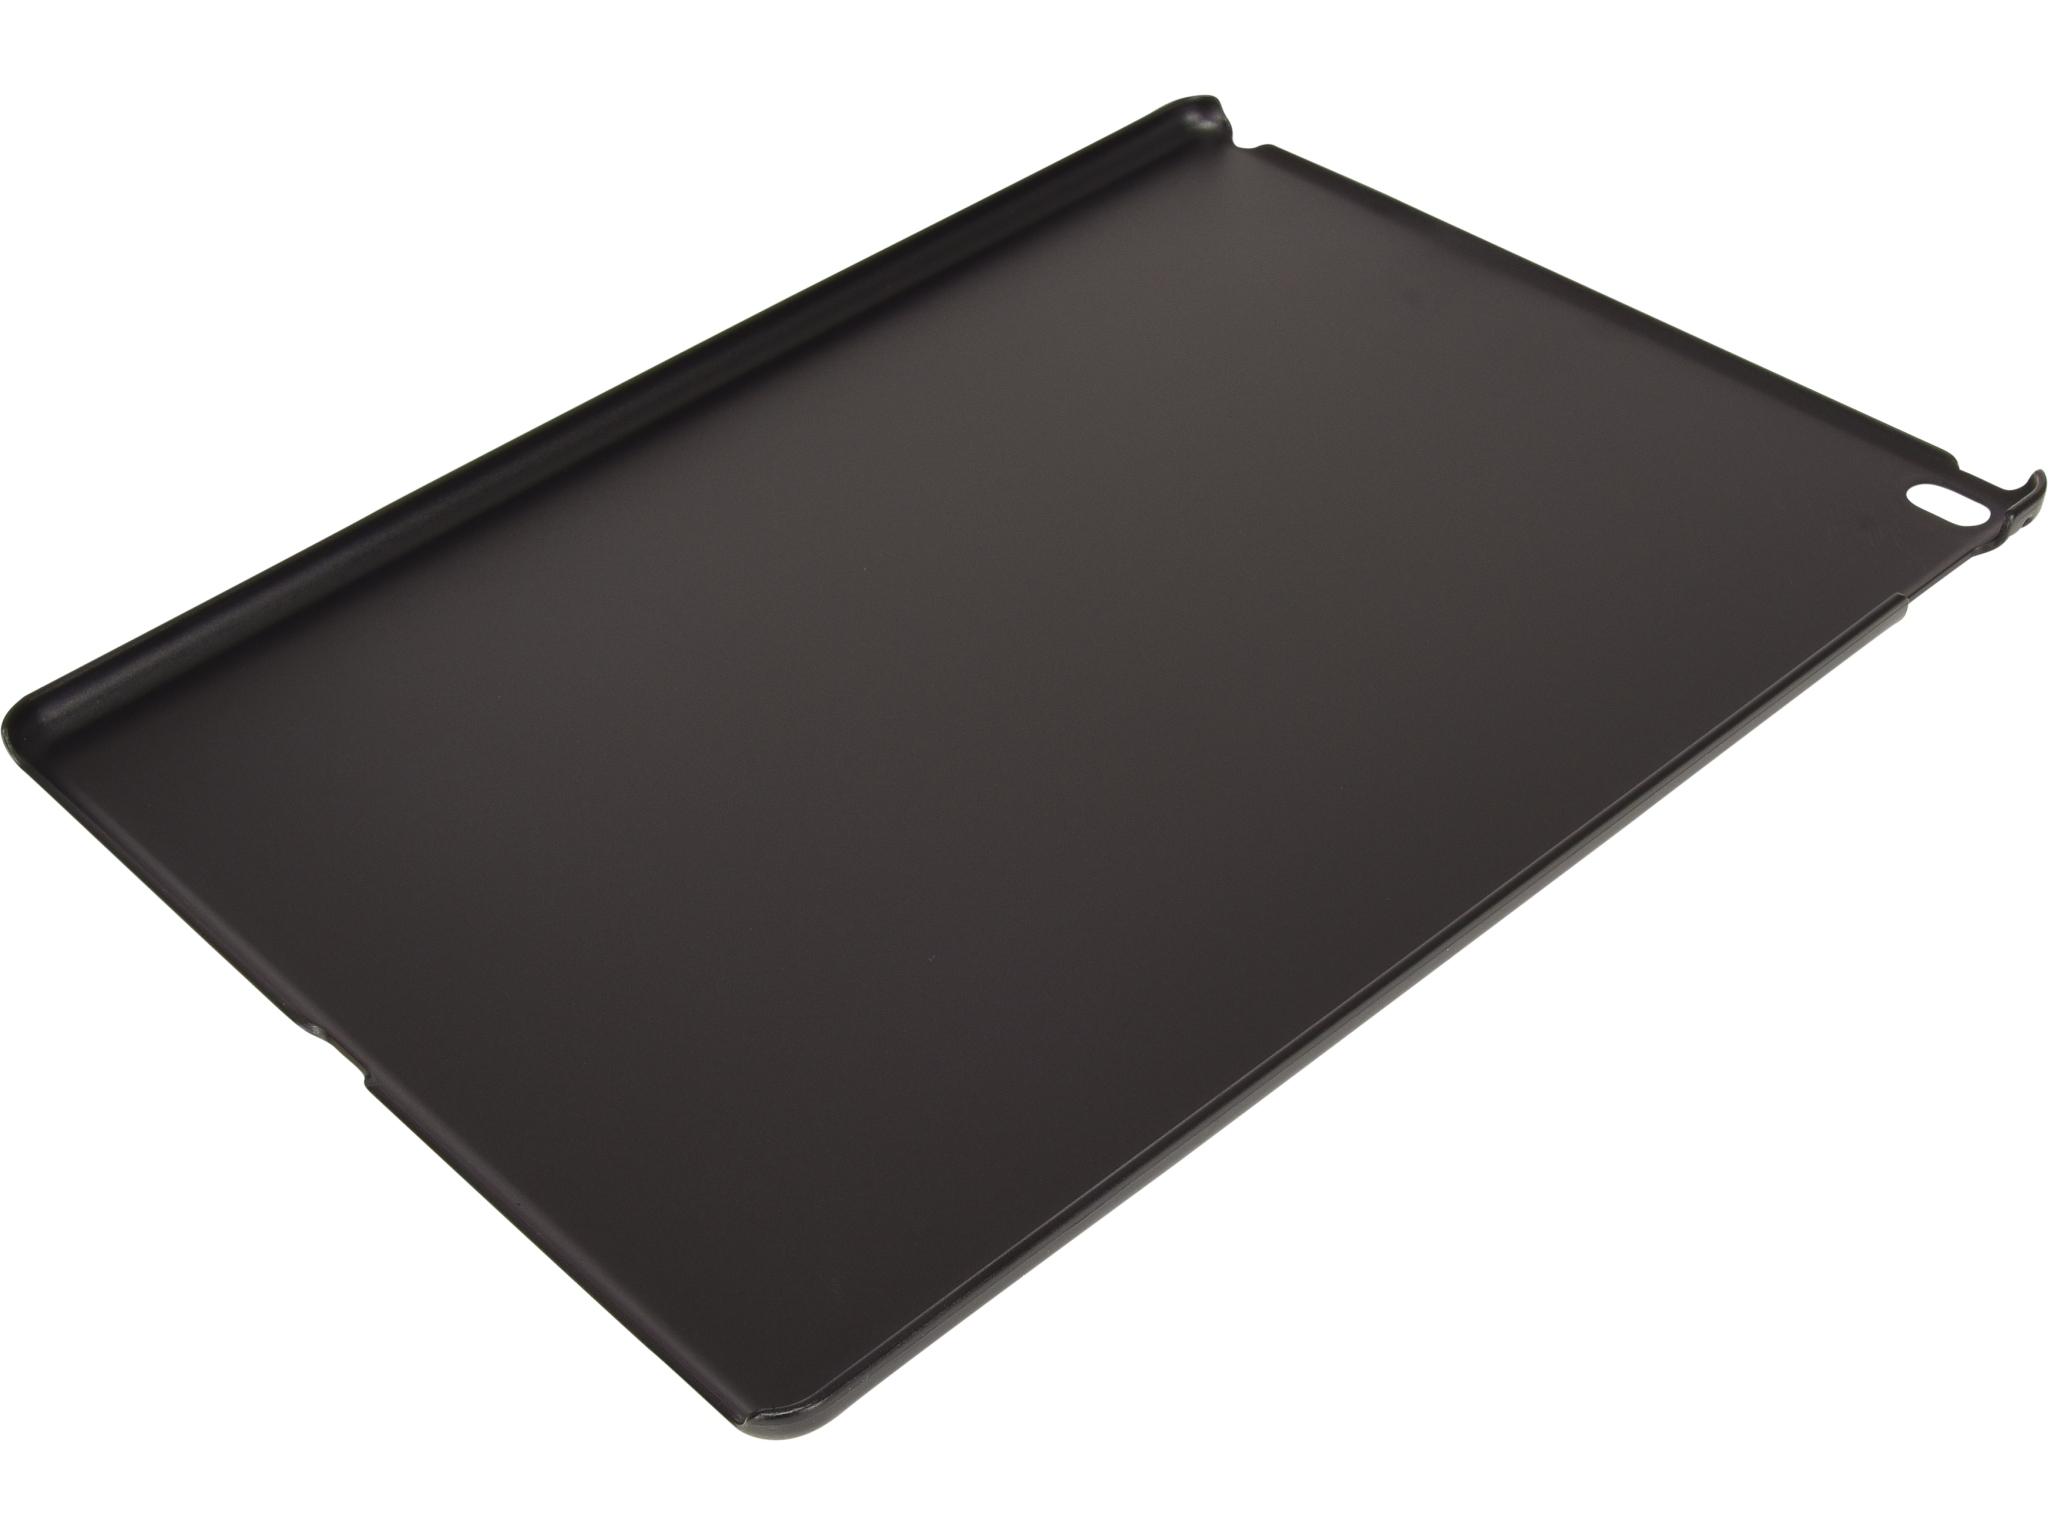 Cover iPad Pro 12.9 hard (2017)